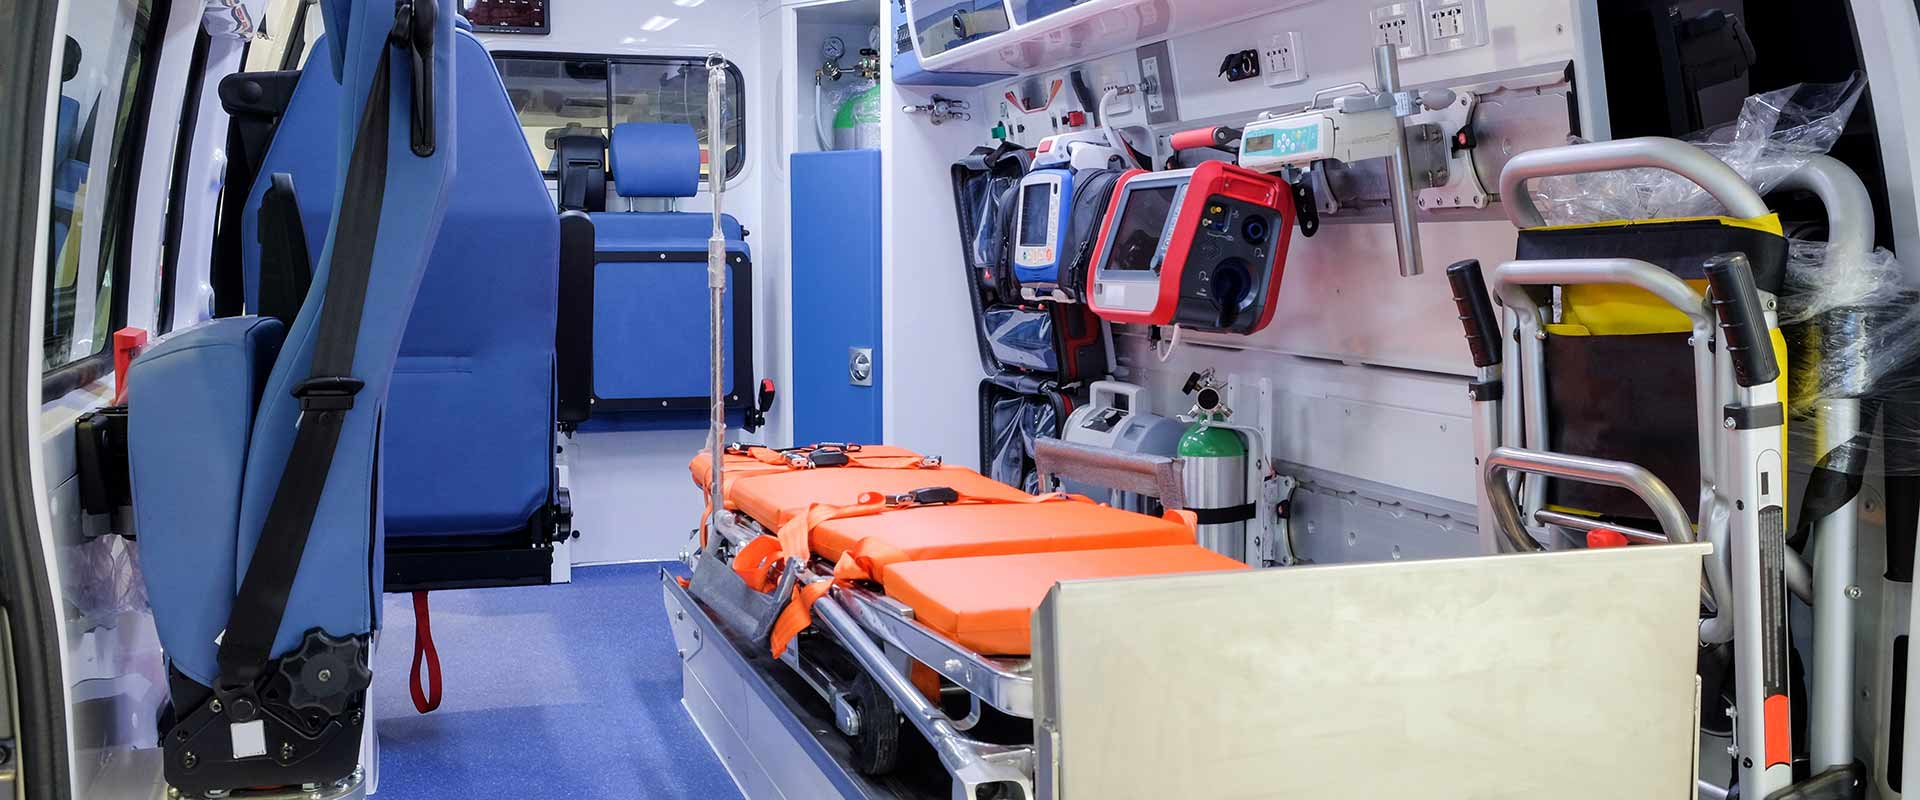 transport-ambulance